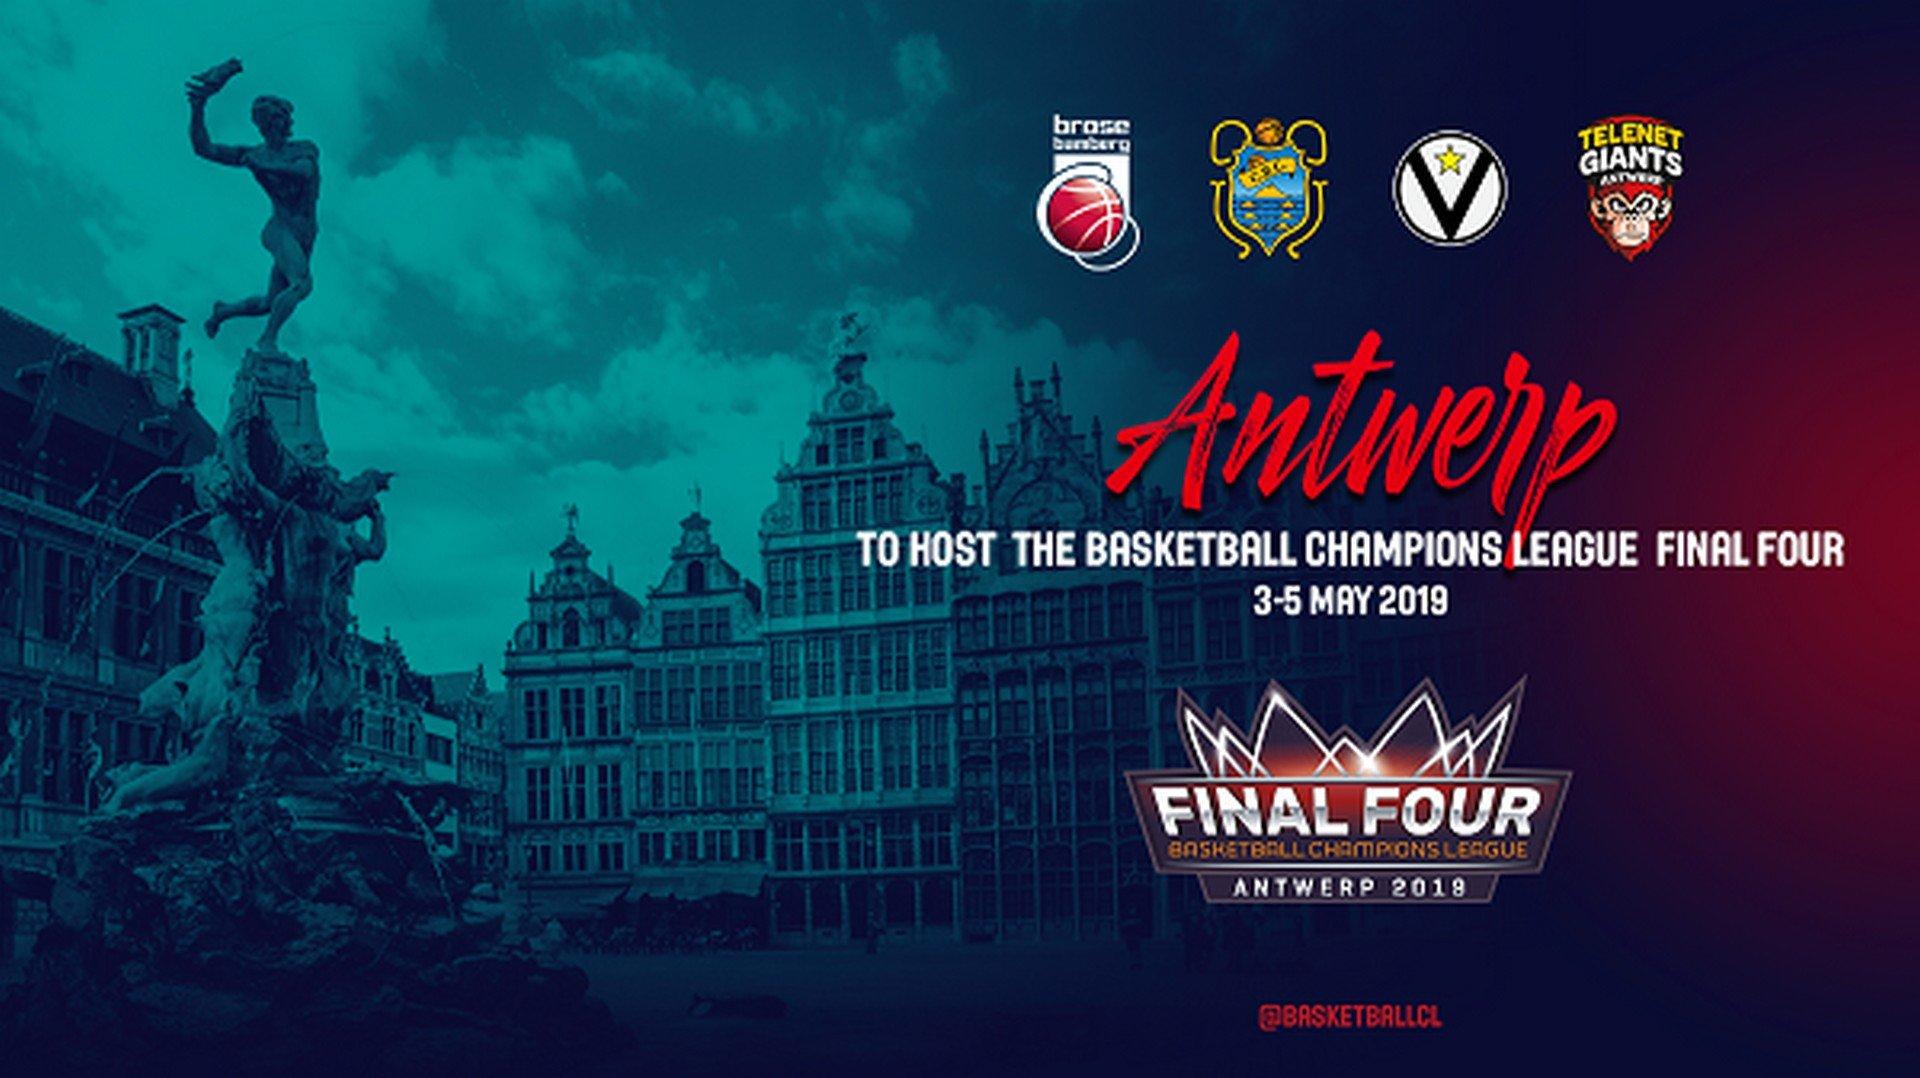 Antwerpen gaststad voor Basketball Champions League Final Four - Champions Laegue Antwerpen